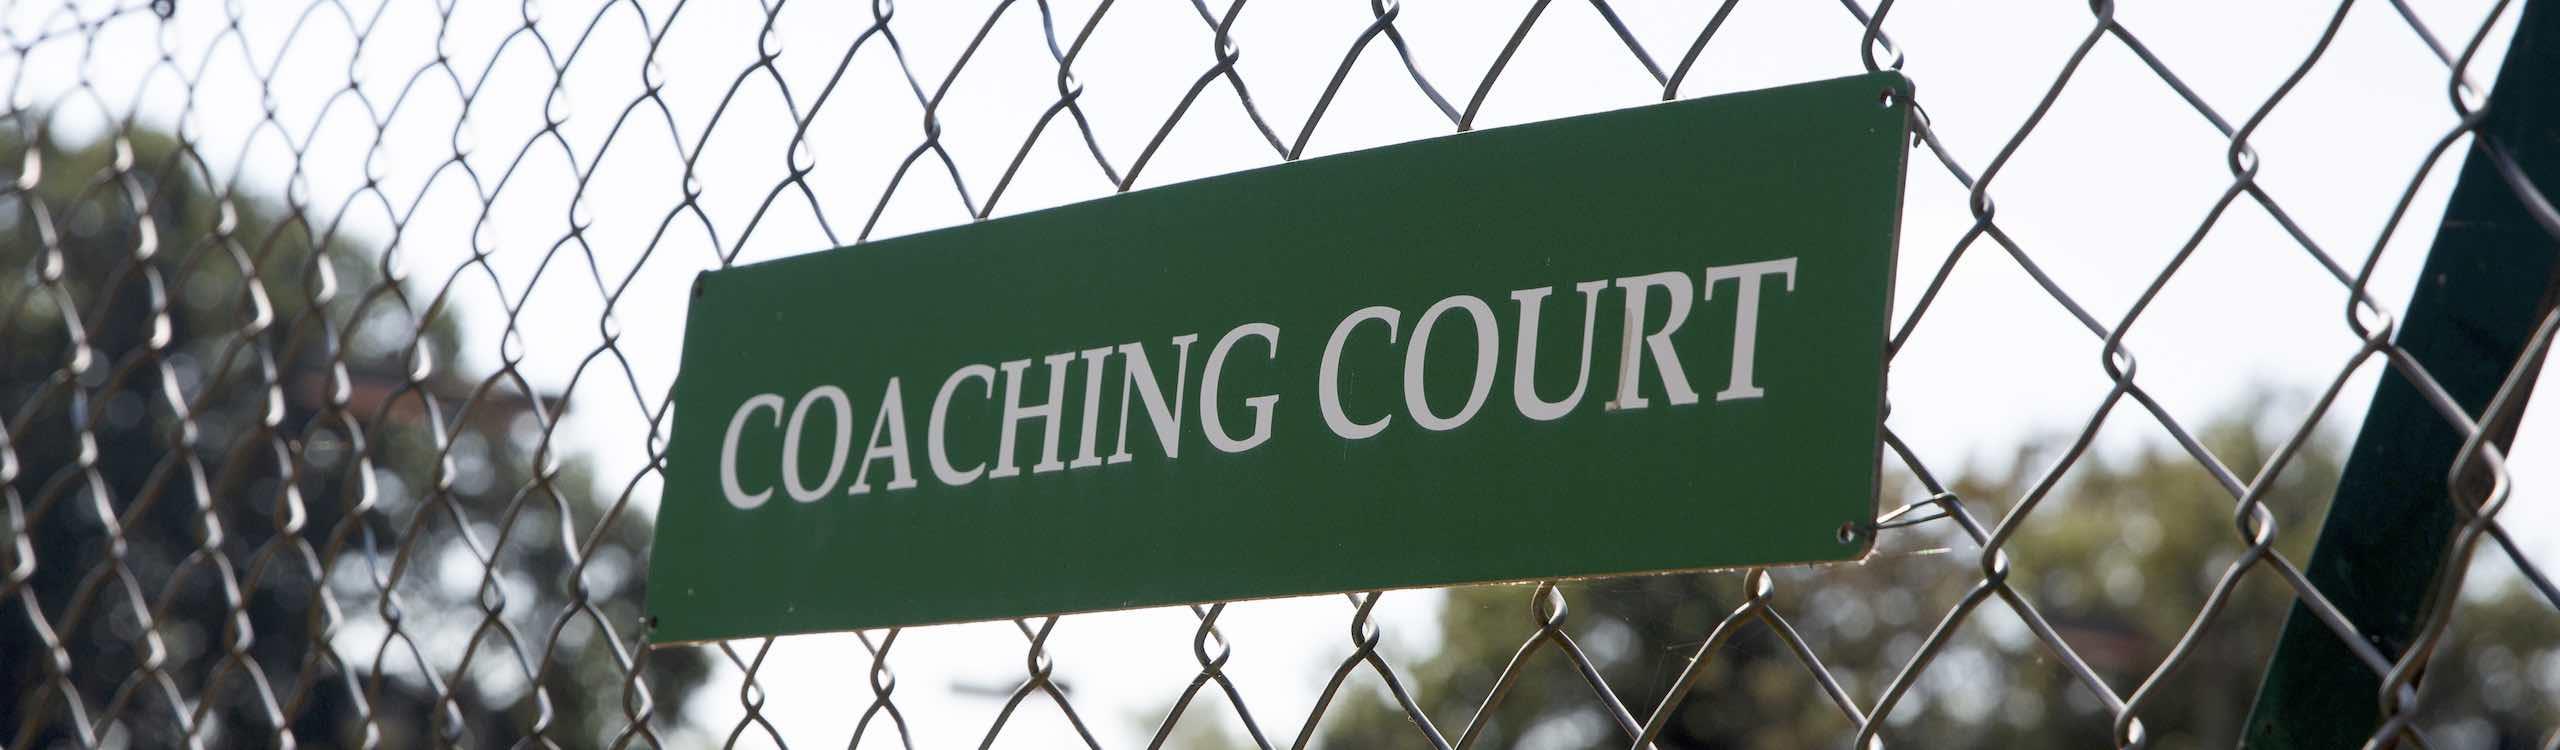 Coaching at Dorking Lawn Tennis & Squash Club